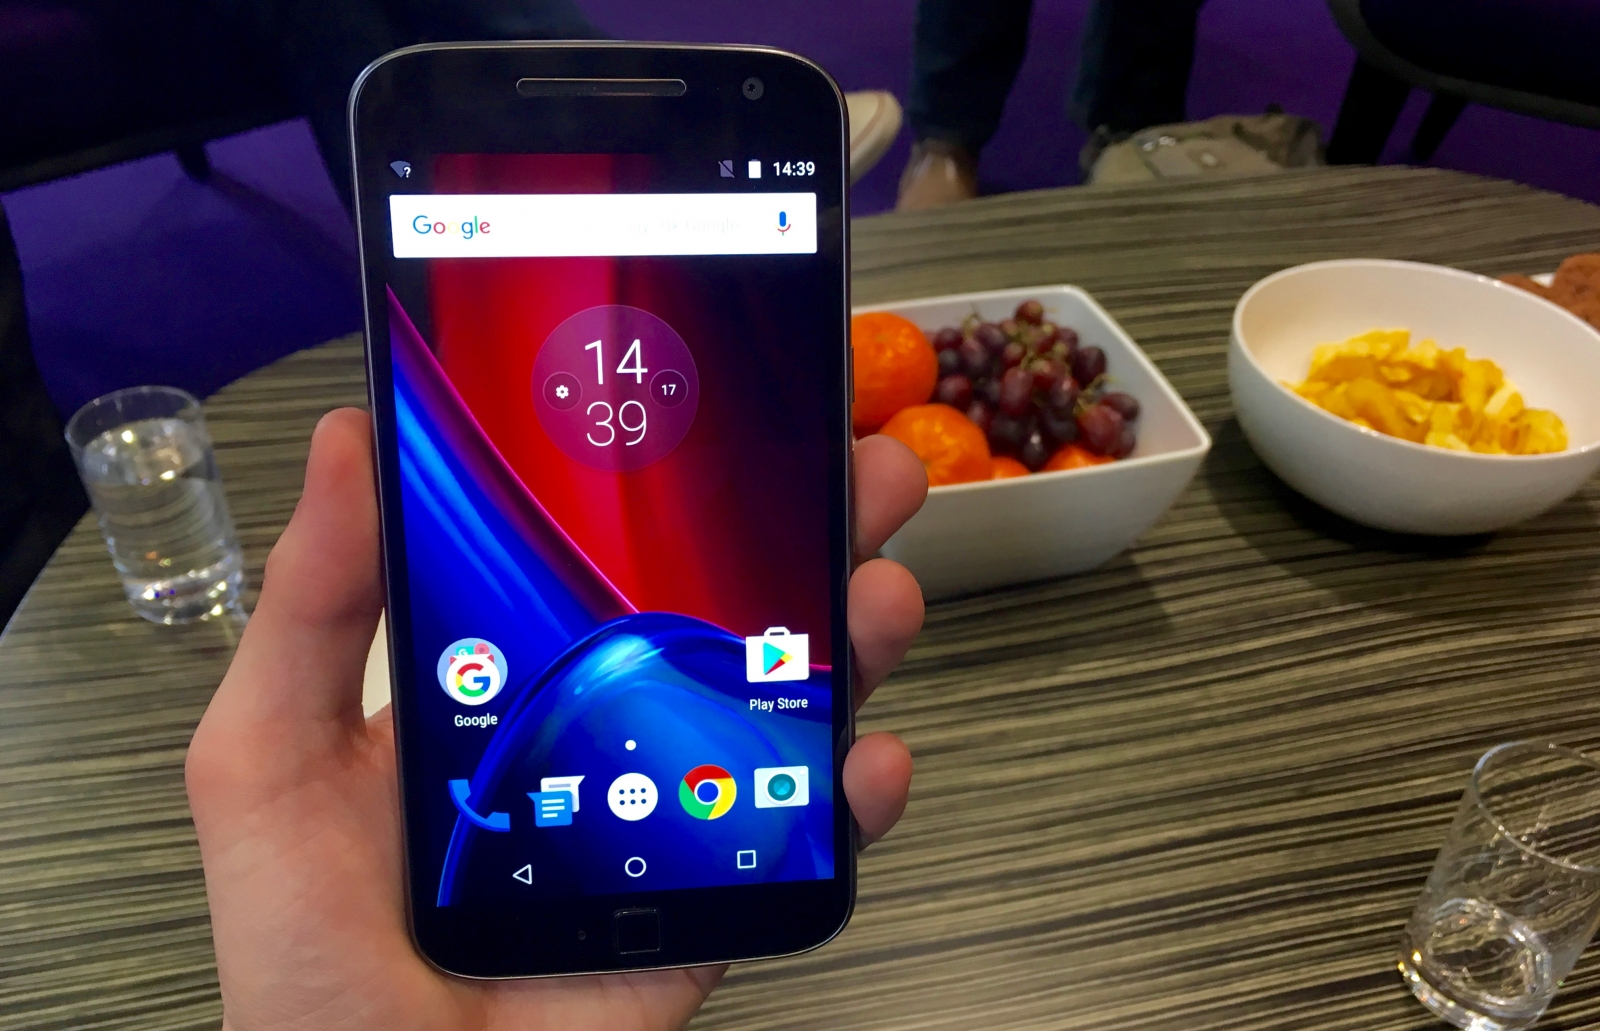 Moto G4 Plus review: Big screen and better camera improve